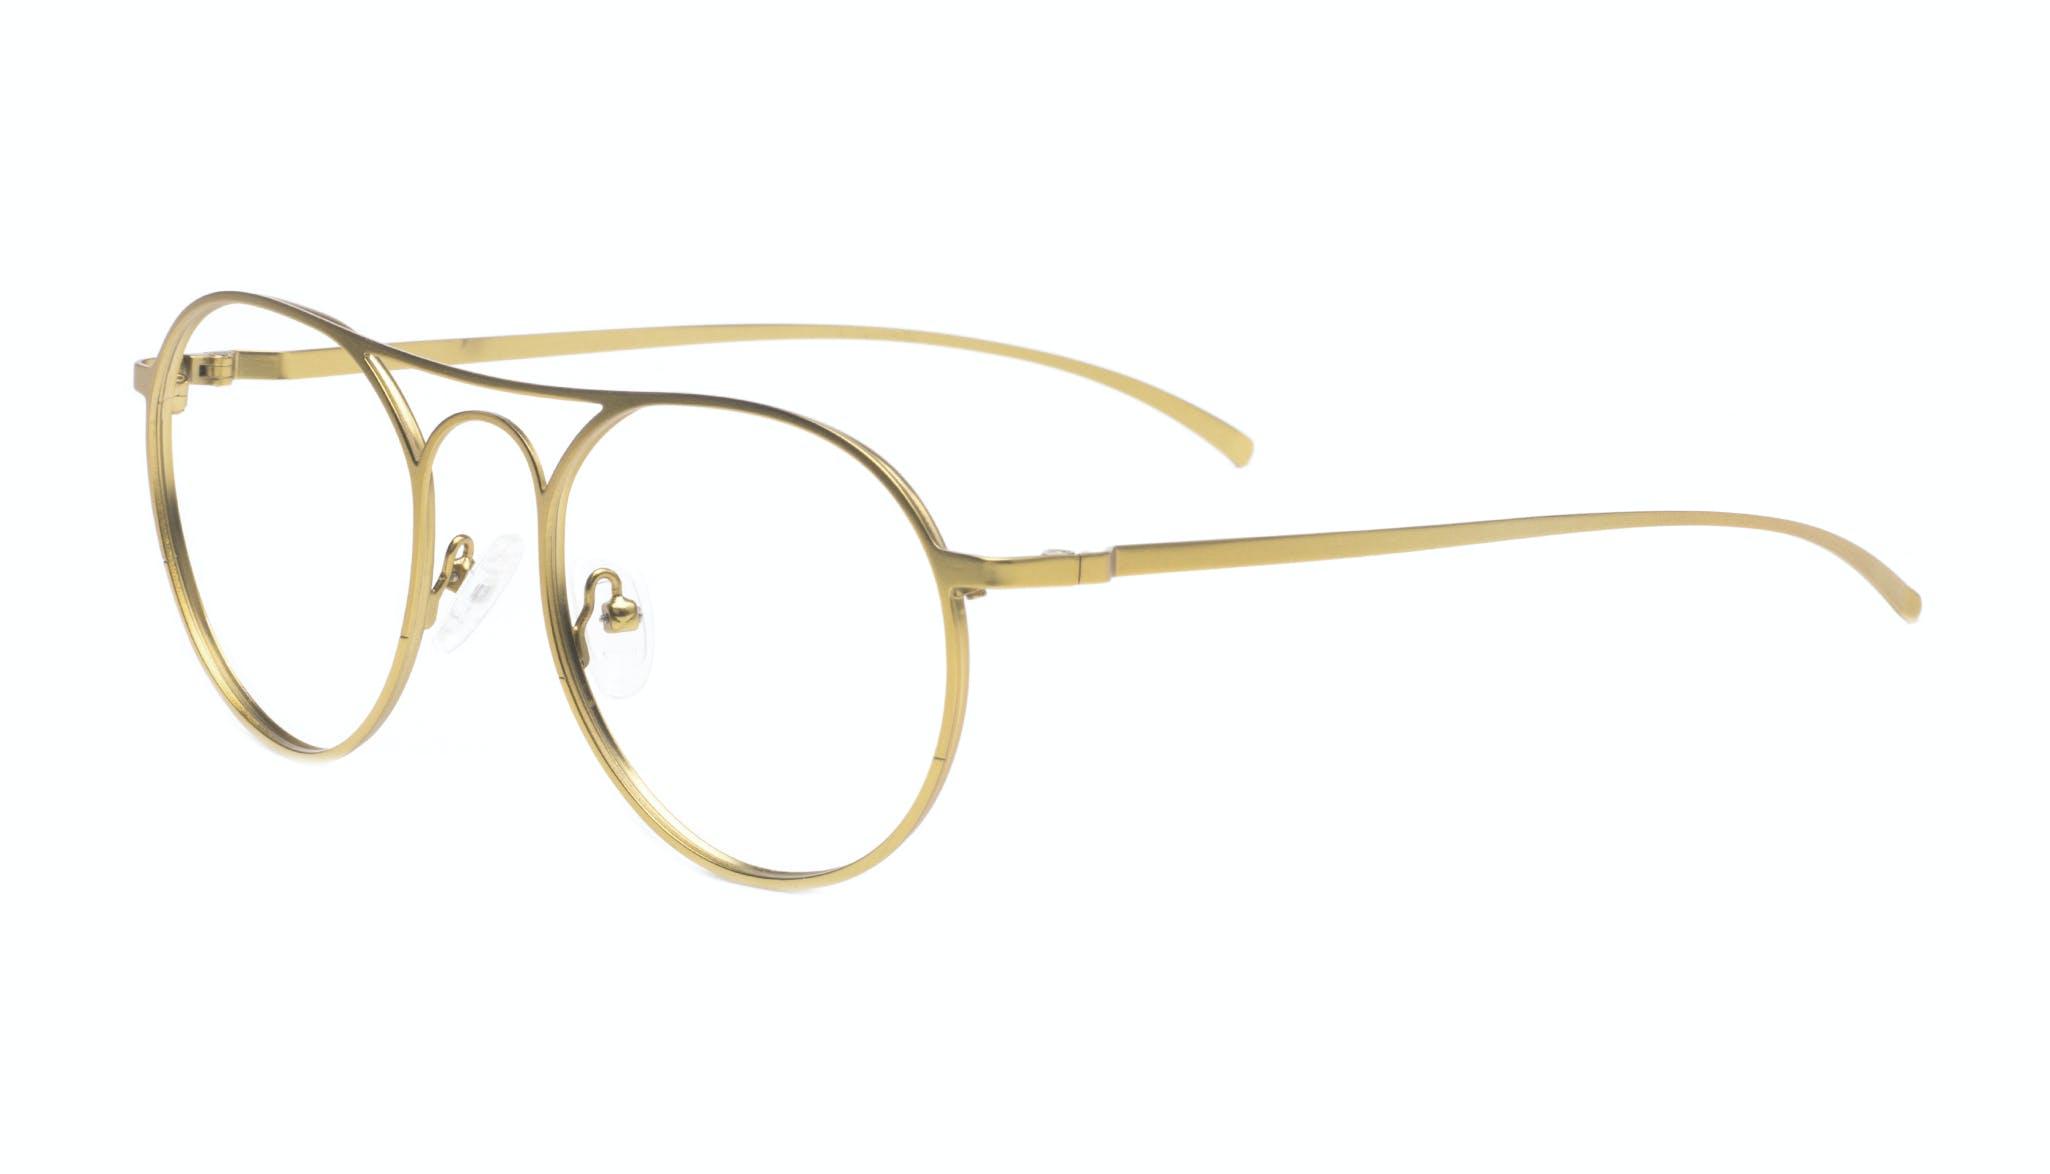 Affordable Fashion Glasses Aviator Round Eyeglasses Men Contour Gold Tilt